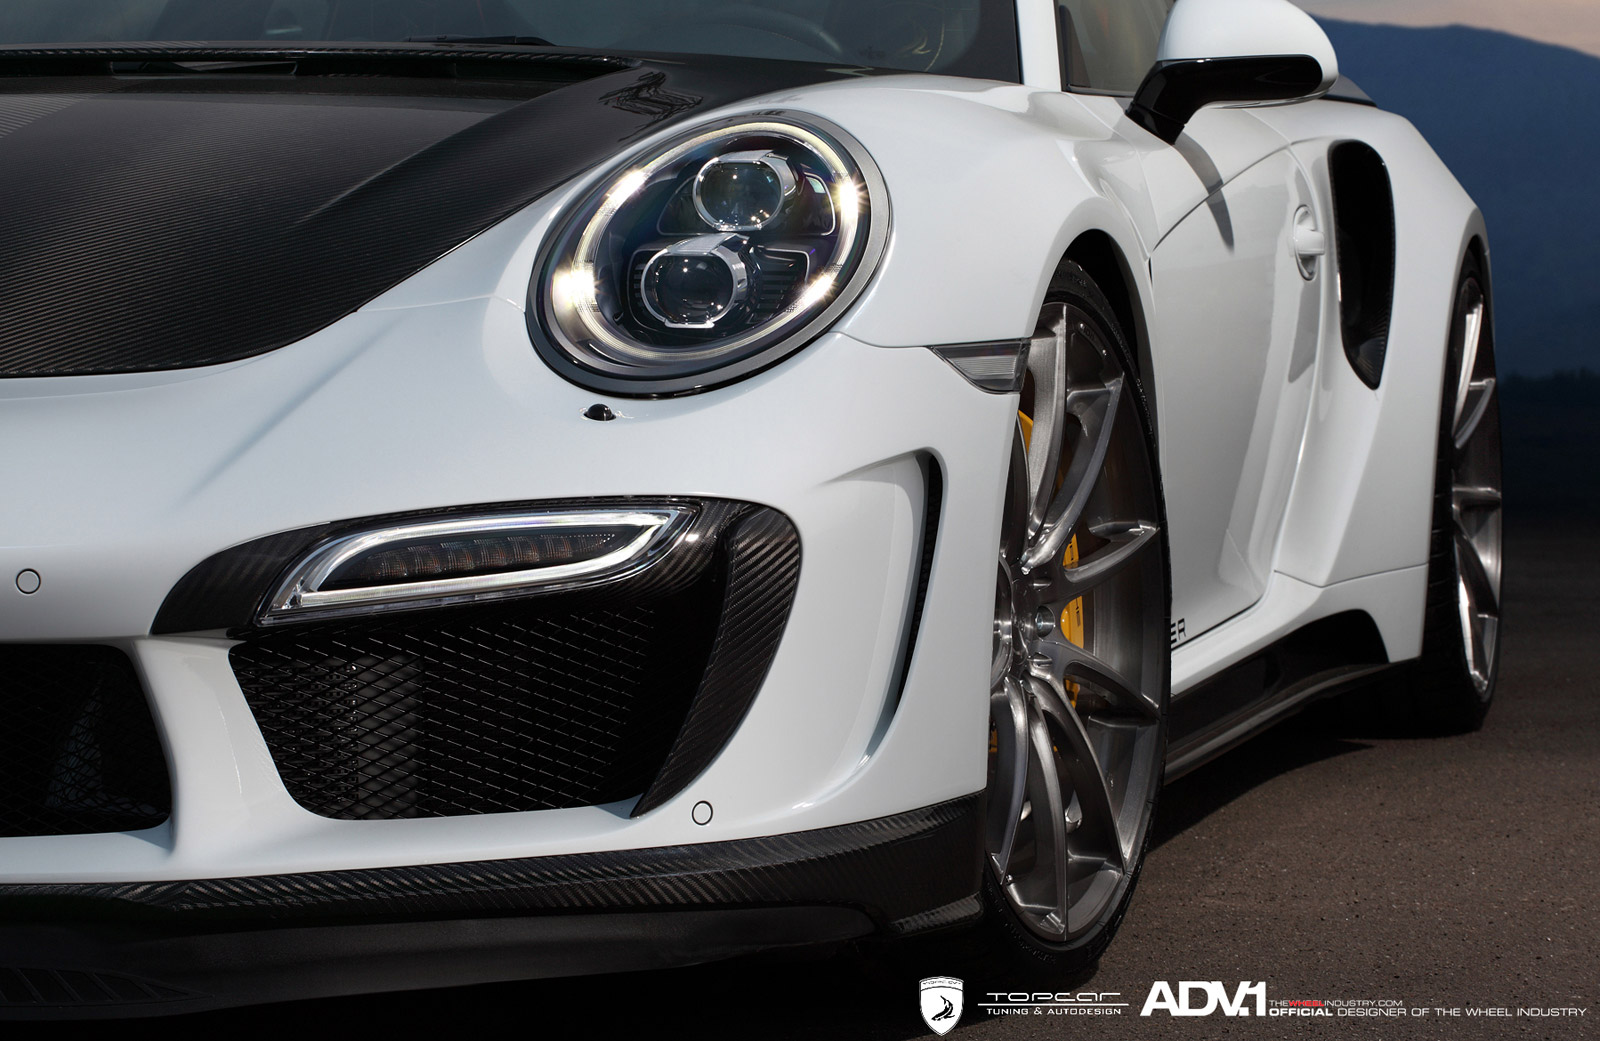 porsche-911-turbo-typ-991-topcar-stinger-gtr-009